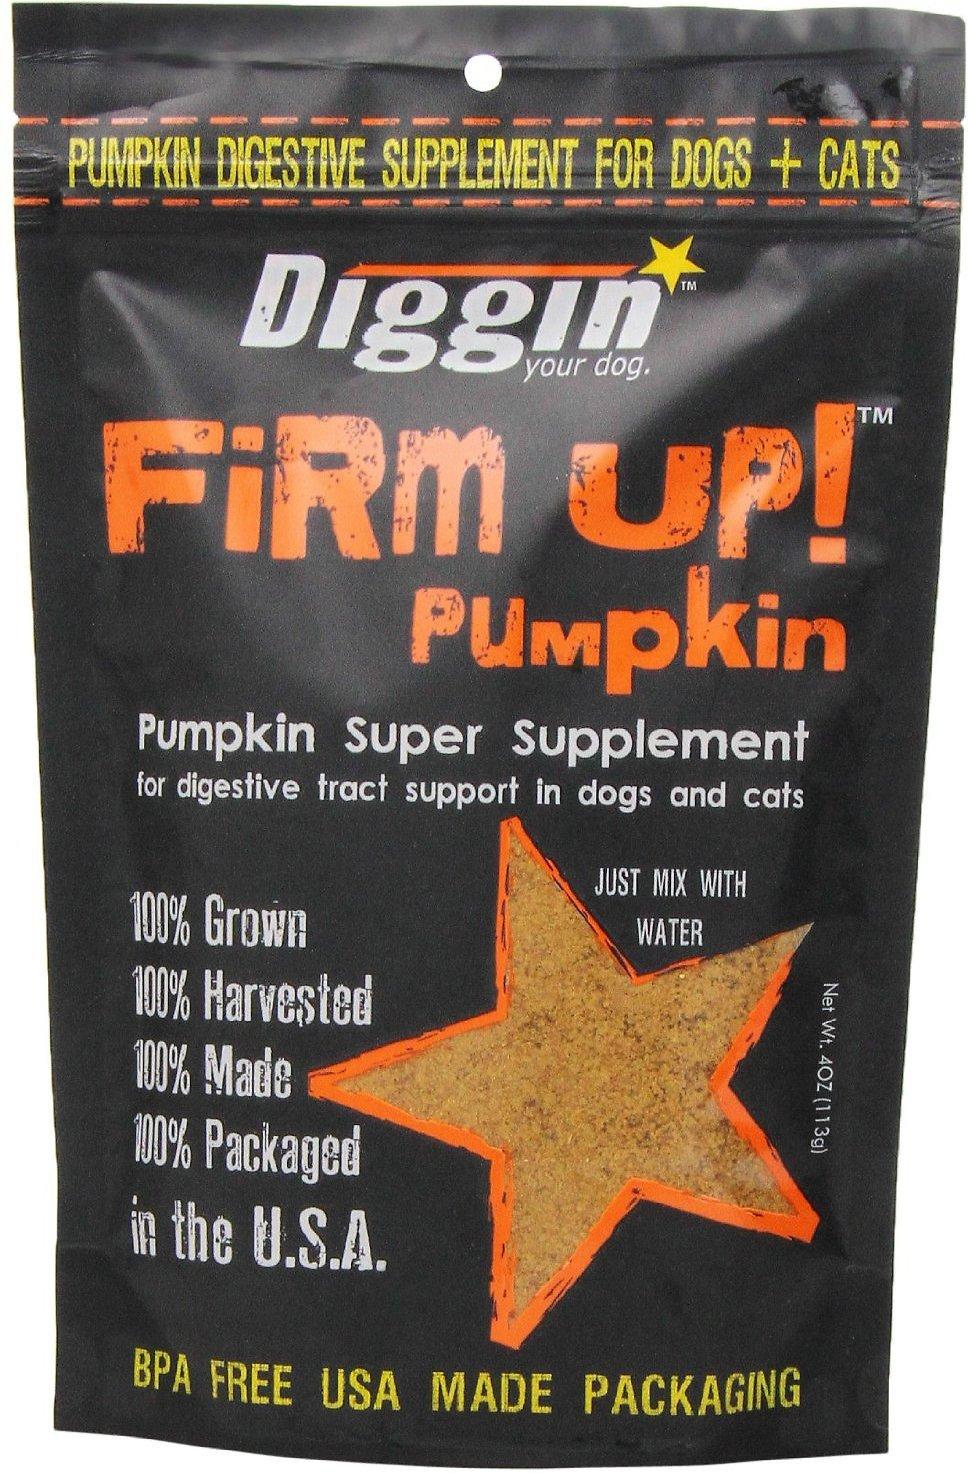 Diggin' Your Dog Firm Up! Pumpkin Super Dog & Cat Supplement Image